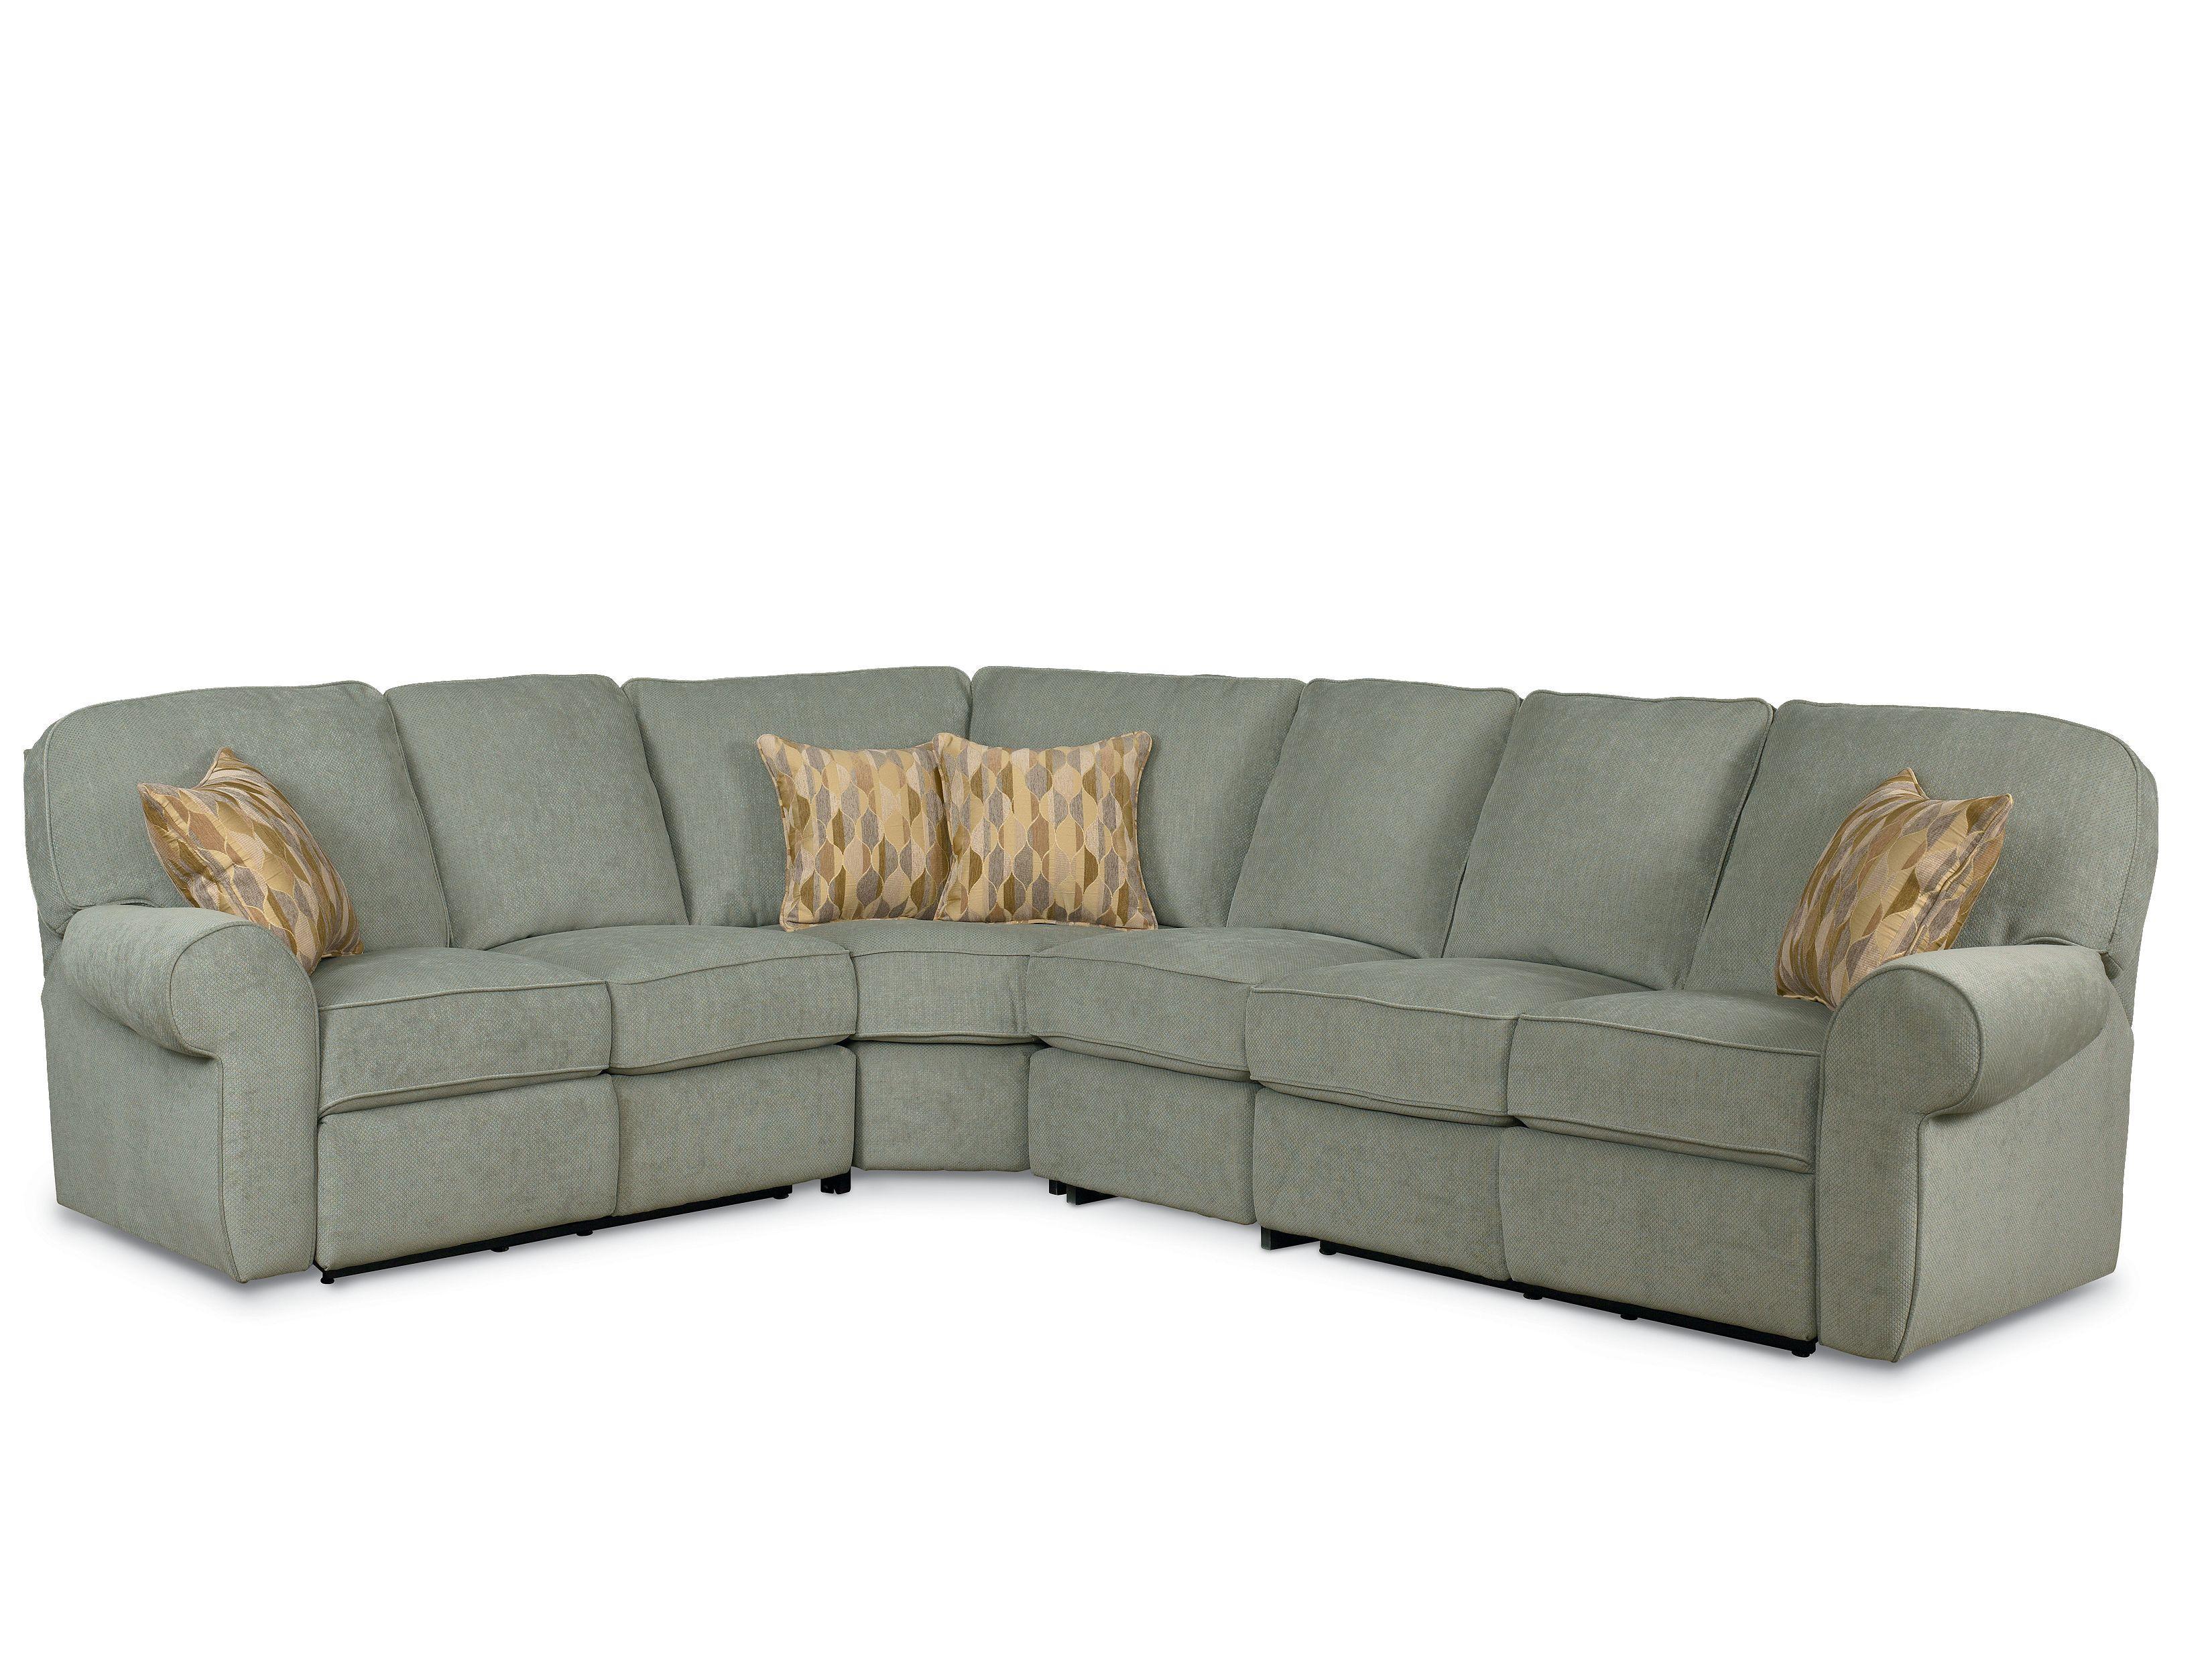 4 piece recliner sectional sofa metal glider lane megan powerized nassau